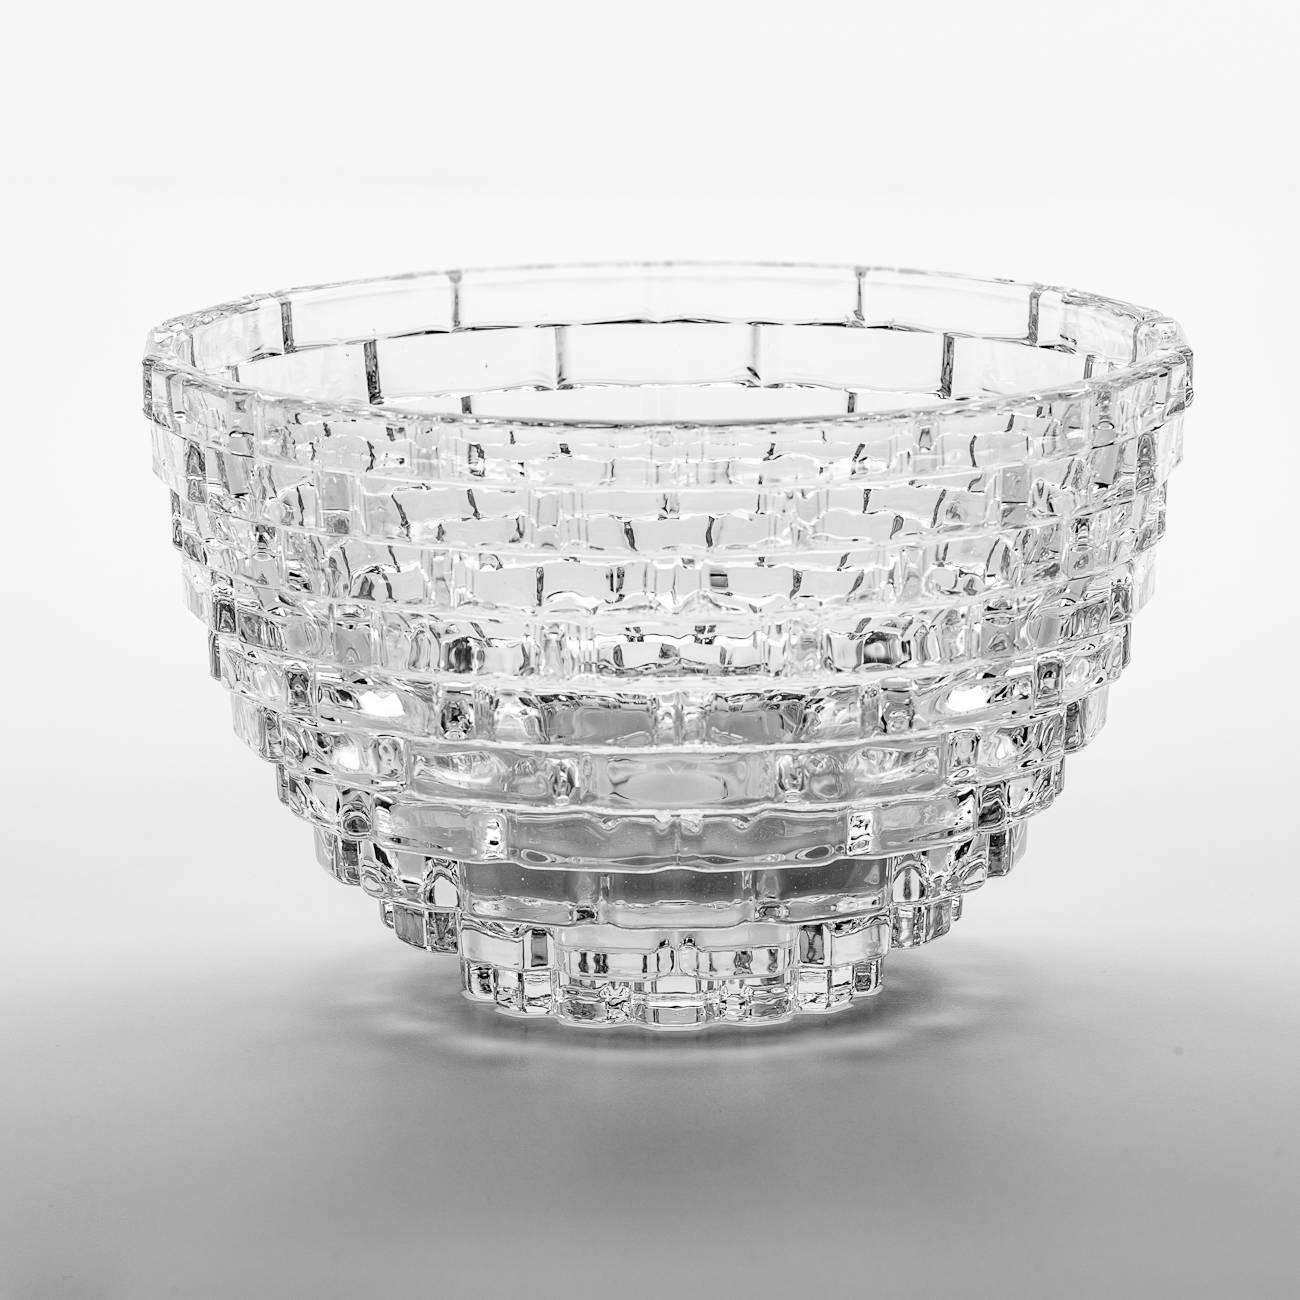 Saladeira Degradê em Cristal c/ Relevo - Wolff - 22,7 cm